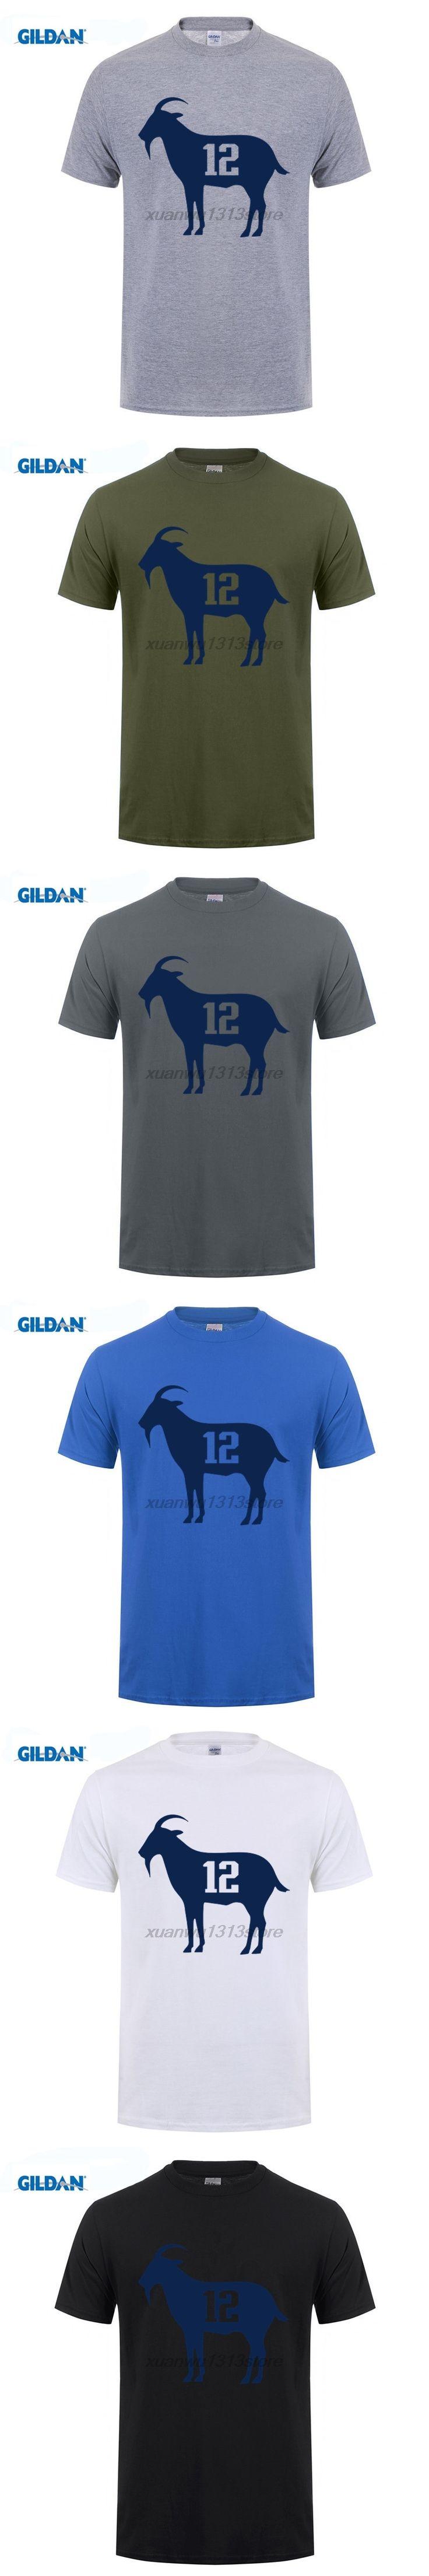 GILDAN Goat Tb12 Tom Brady T Shirt Adult Personality Tee Shirt Cool Loose T-Shirt Man Short Sleeve O Neck Graph Dad Clothing